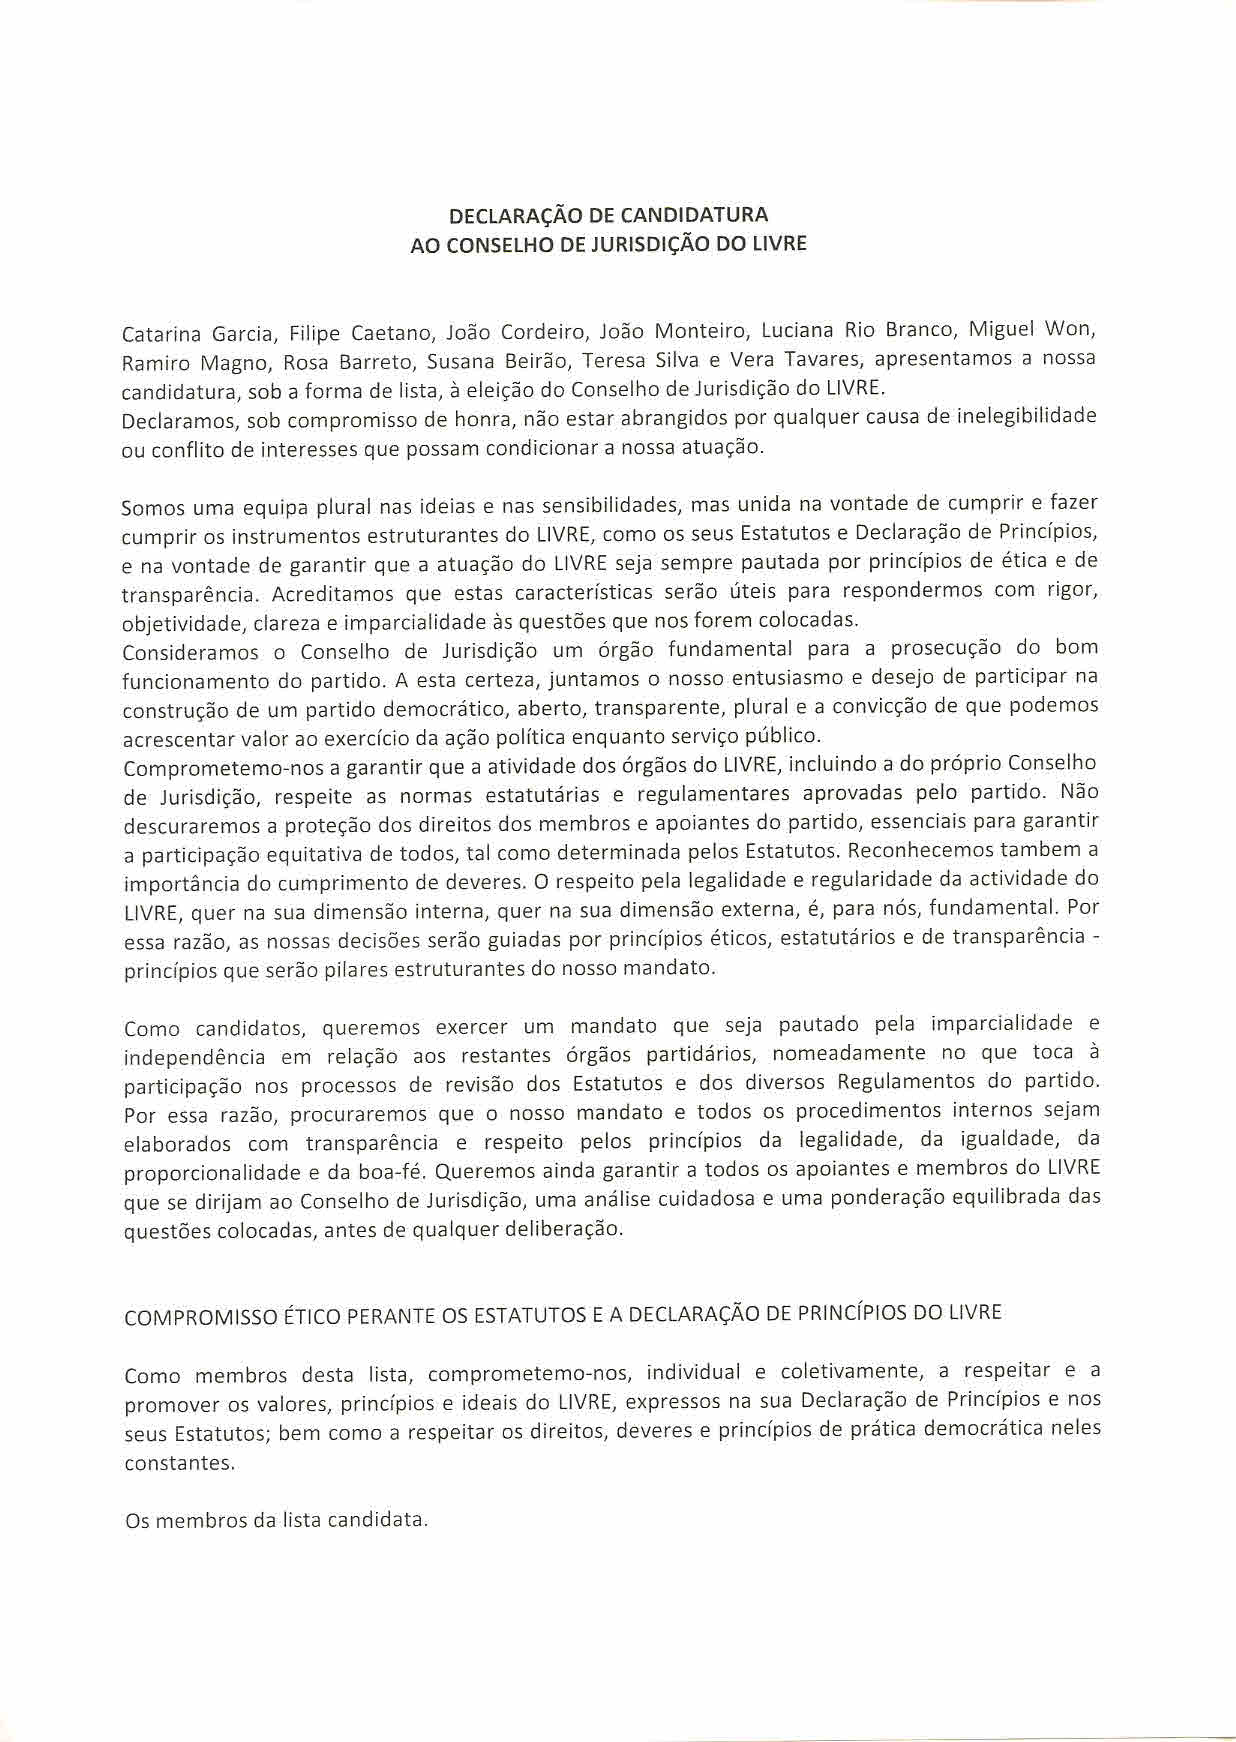 LIVRE_DECLARAÇAOdeCANDIDATURAaoCONSELHOdeJURISDIÇAOdoLIVRE_LISTA_A (2)